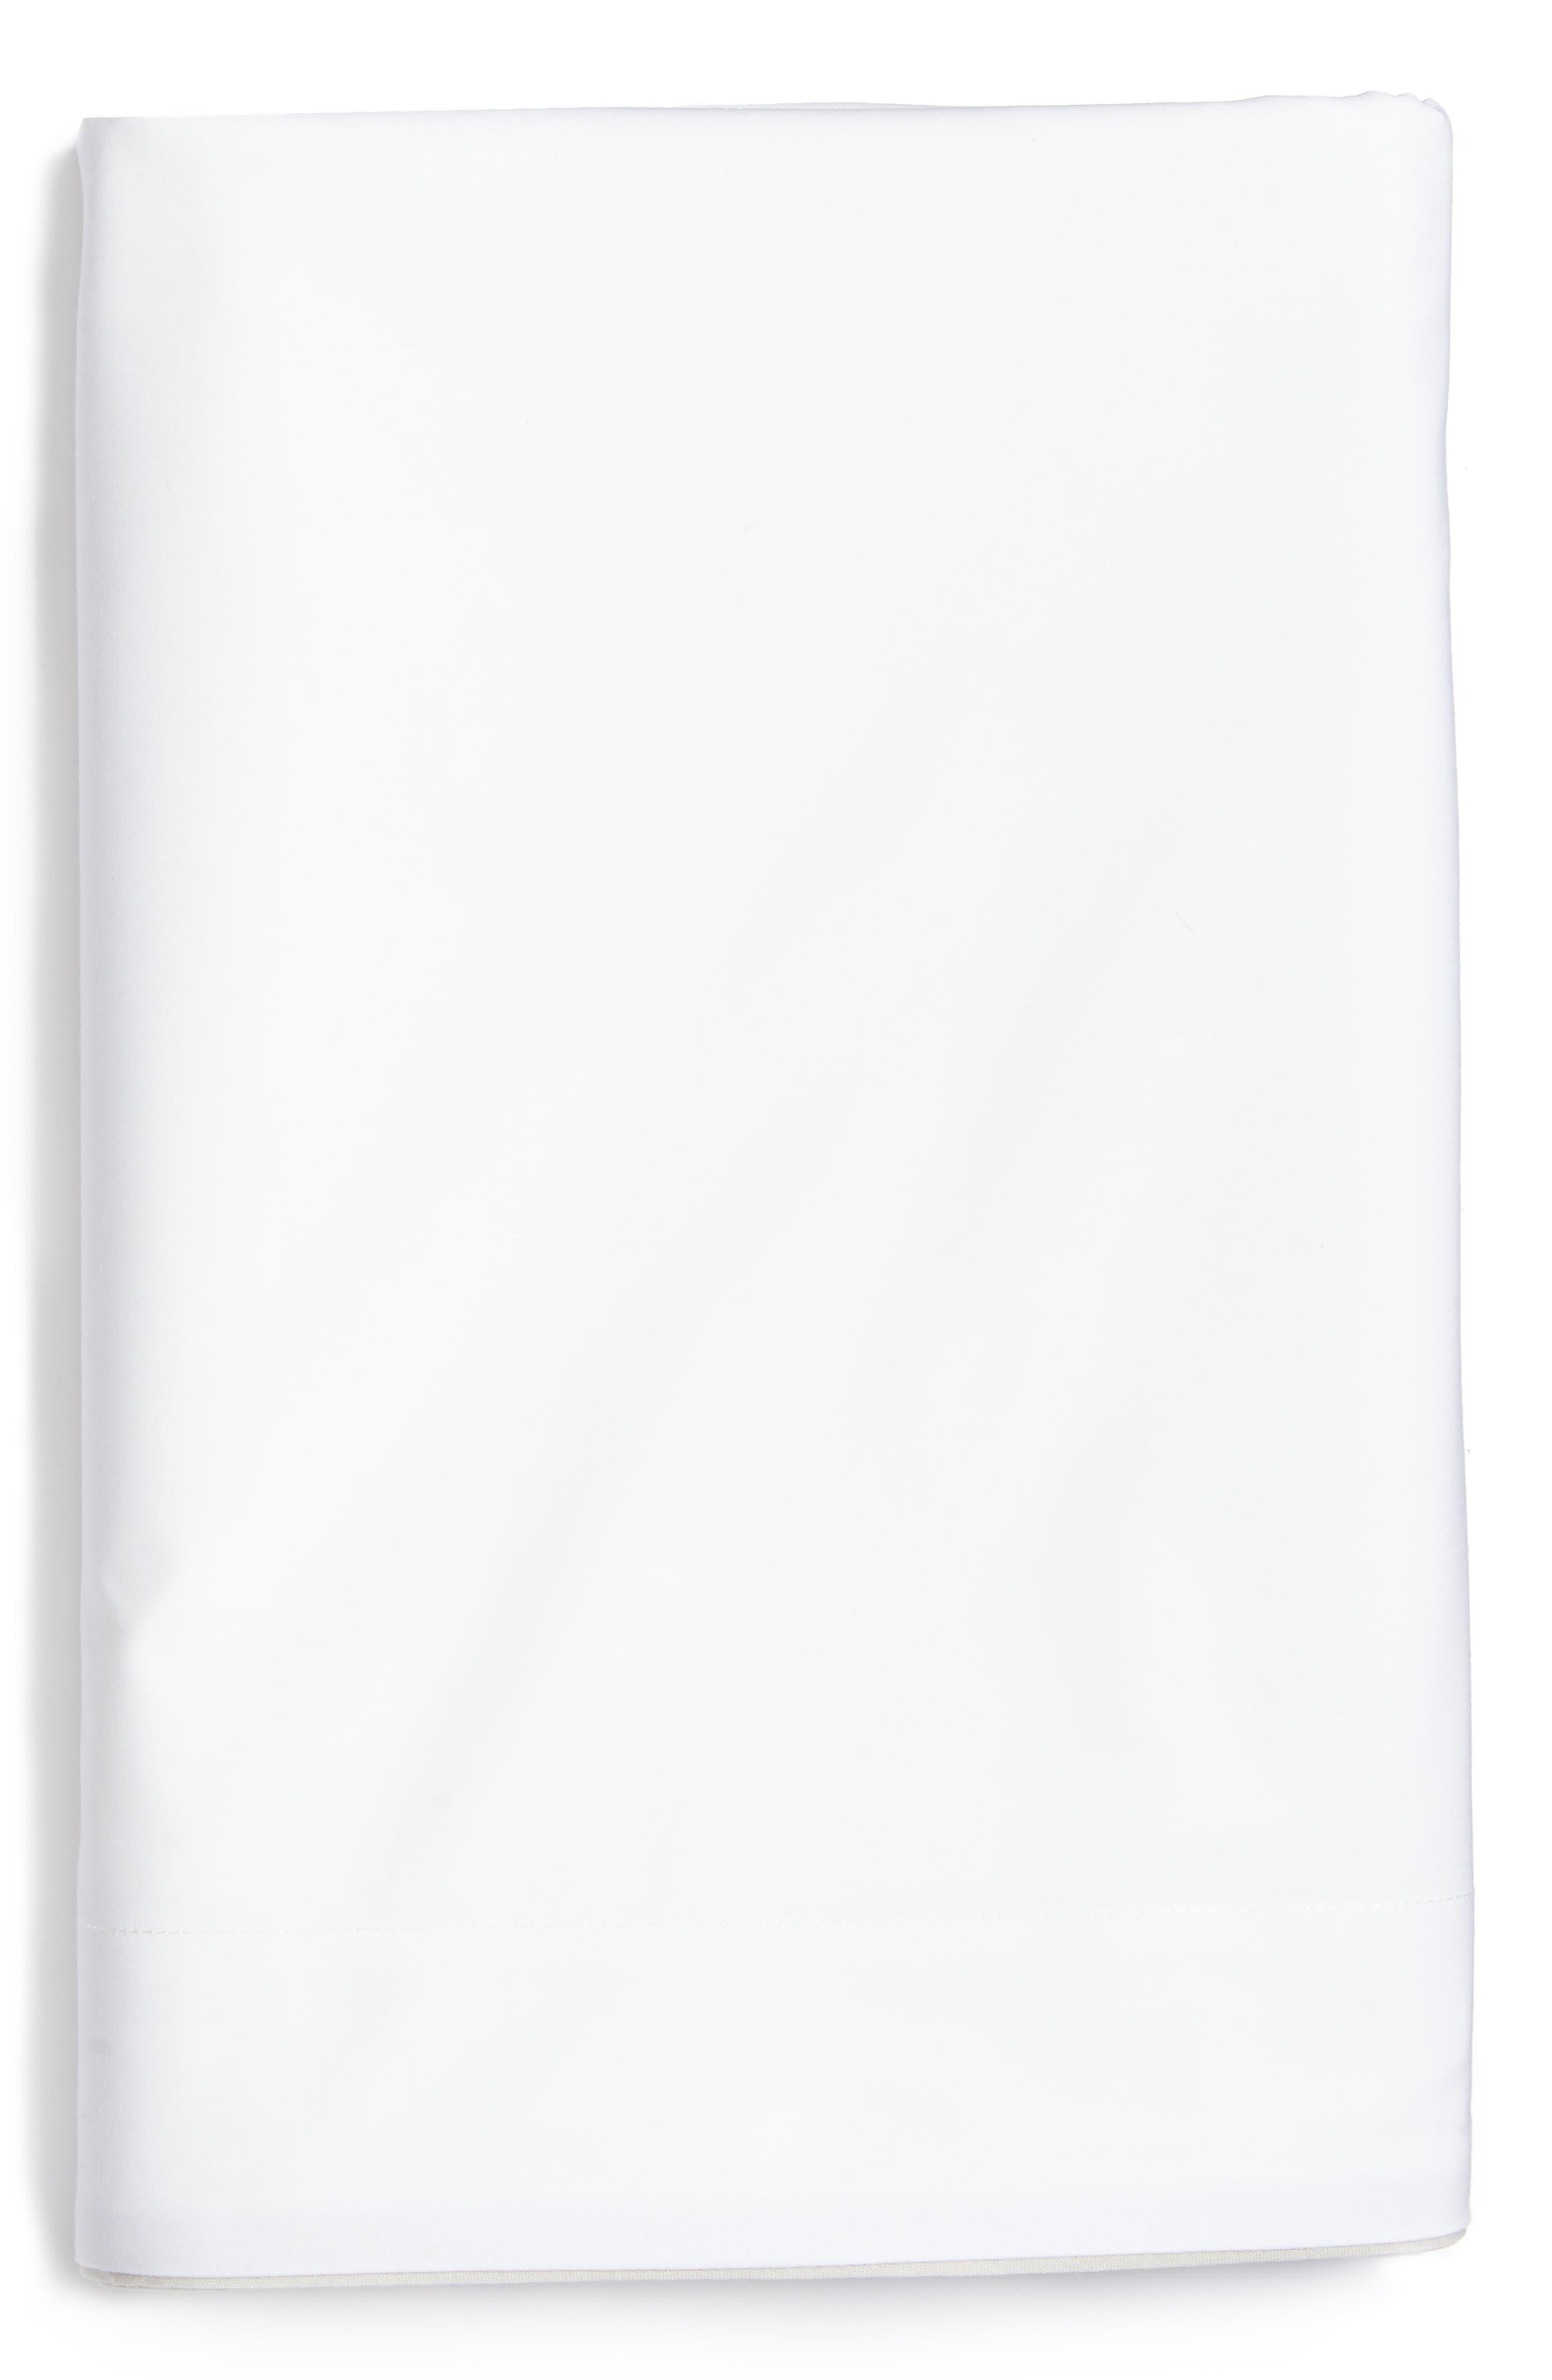 Series 1 500 Thread Count Pillowcases,                             Main thumbnail 1, color,                             GREY